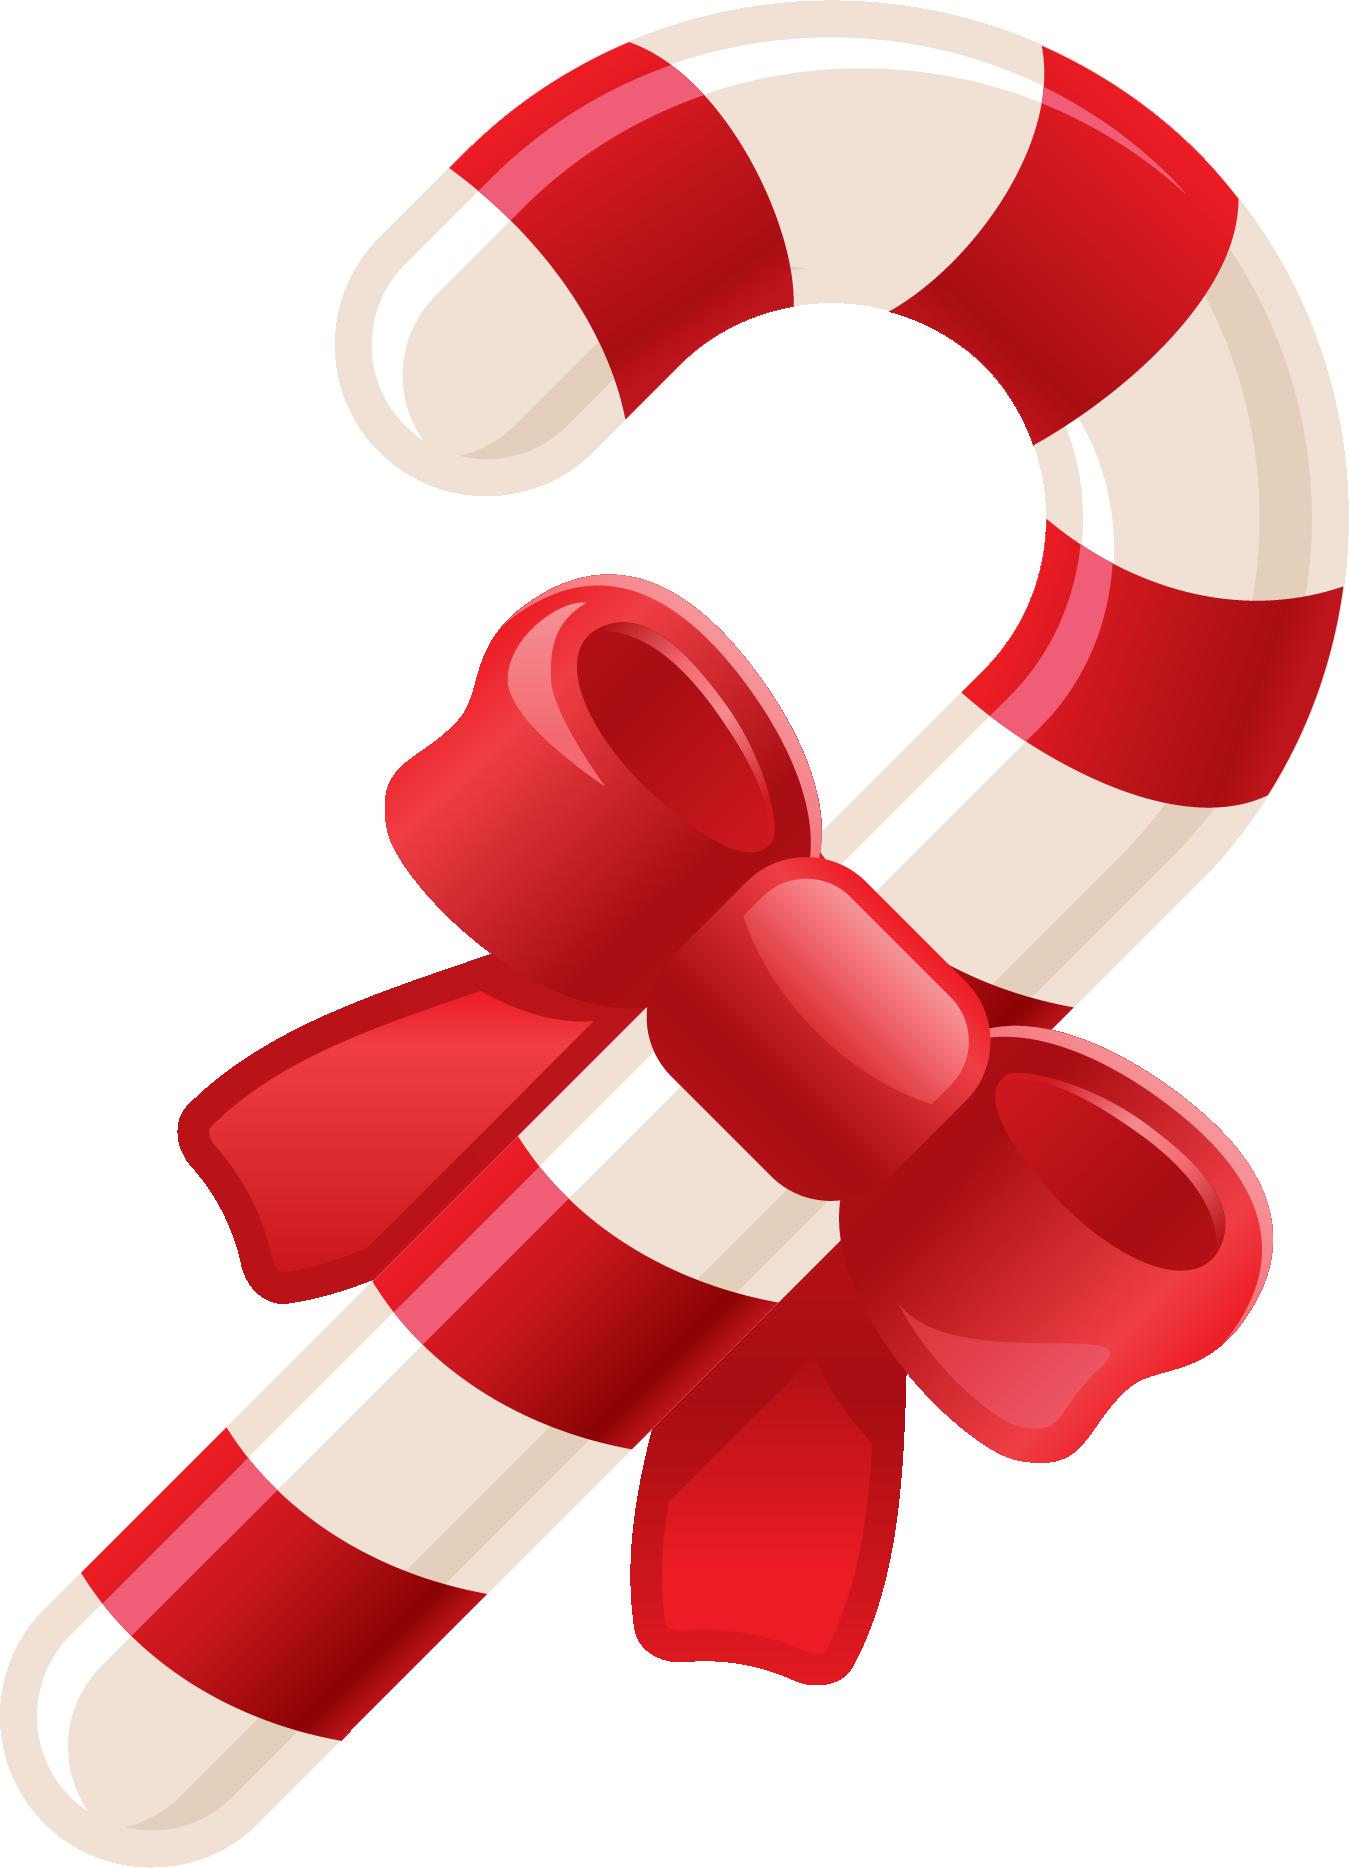 1349x1868 Celebration Clipart Holiday Celebration